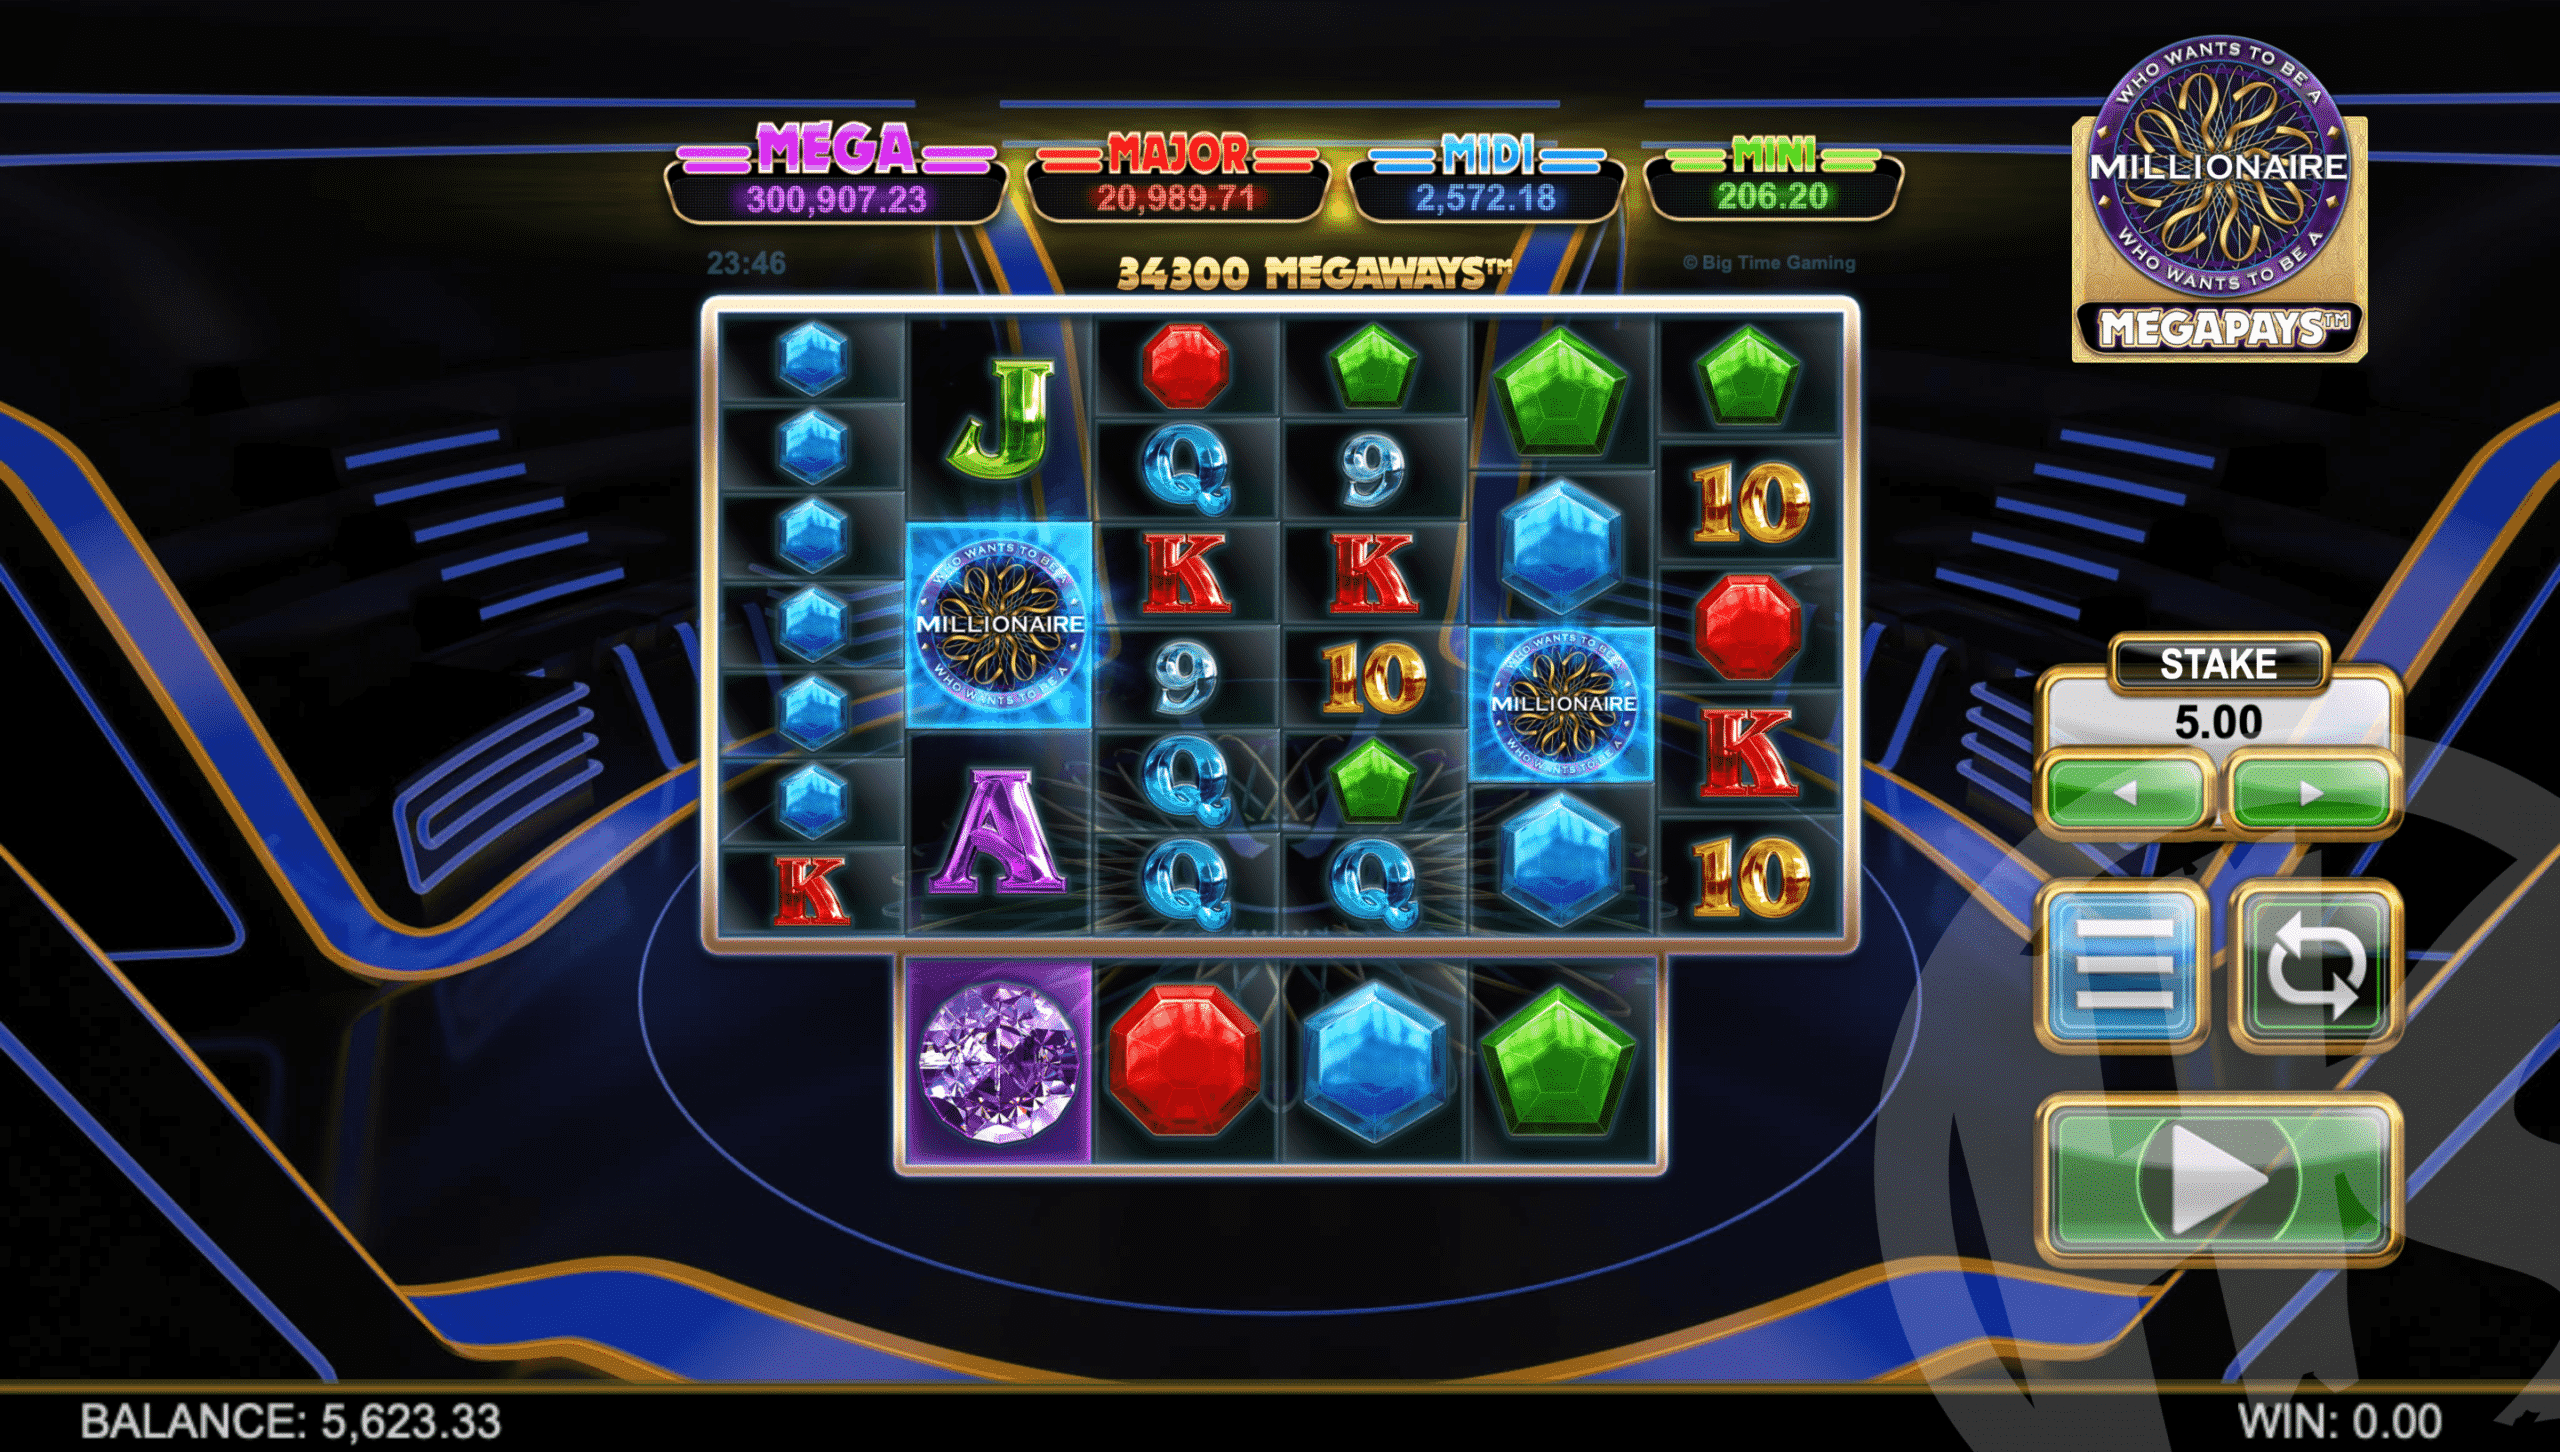 Millionaire Megapays Base Game